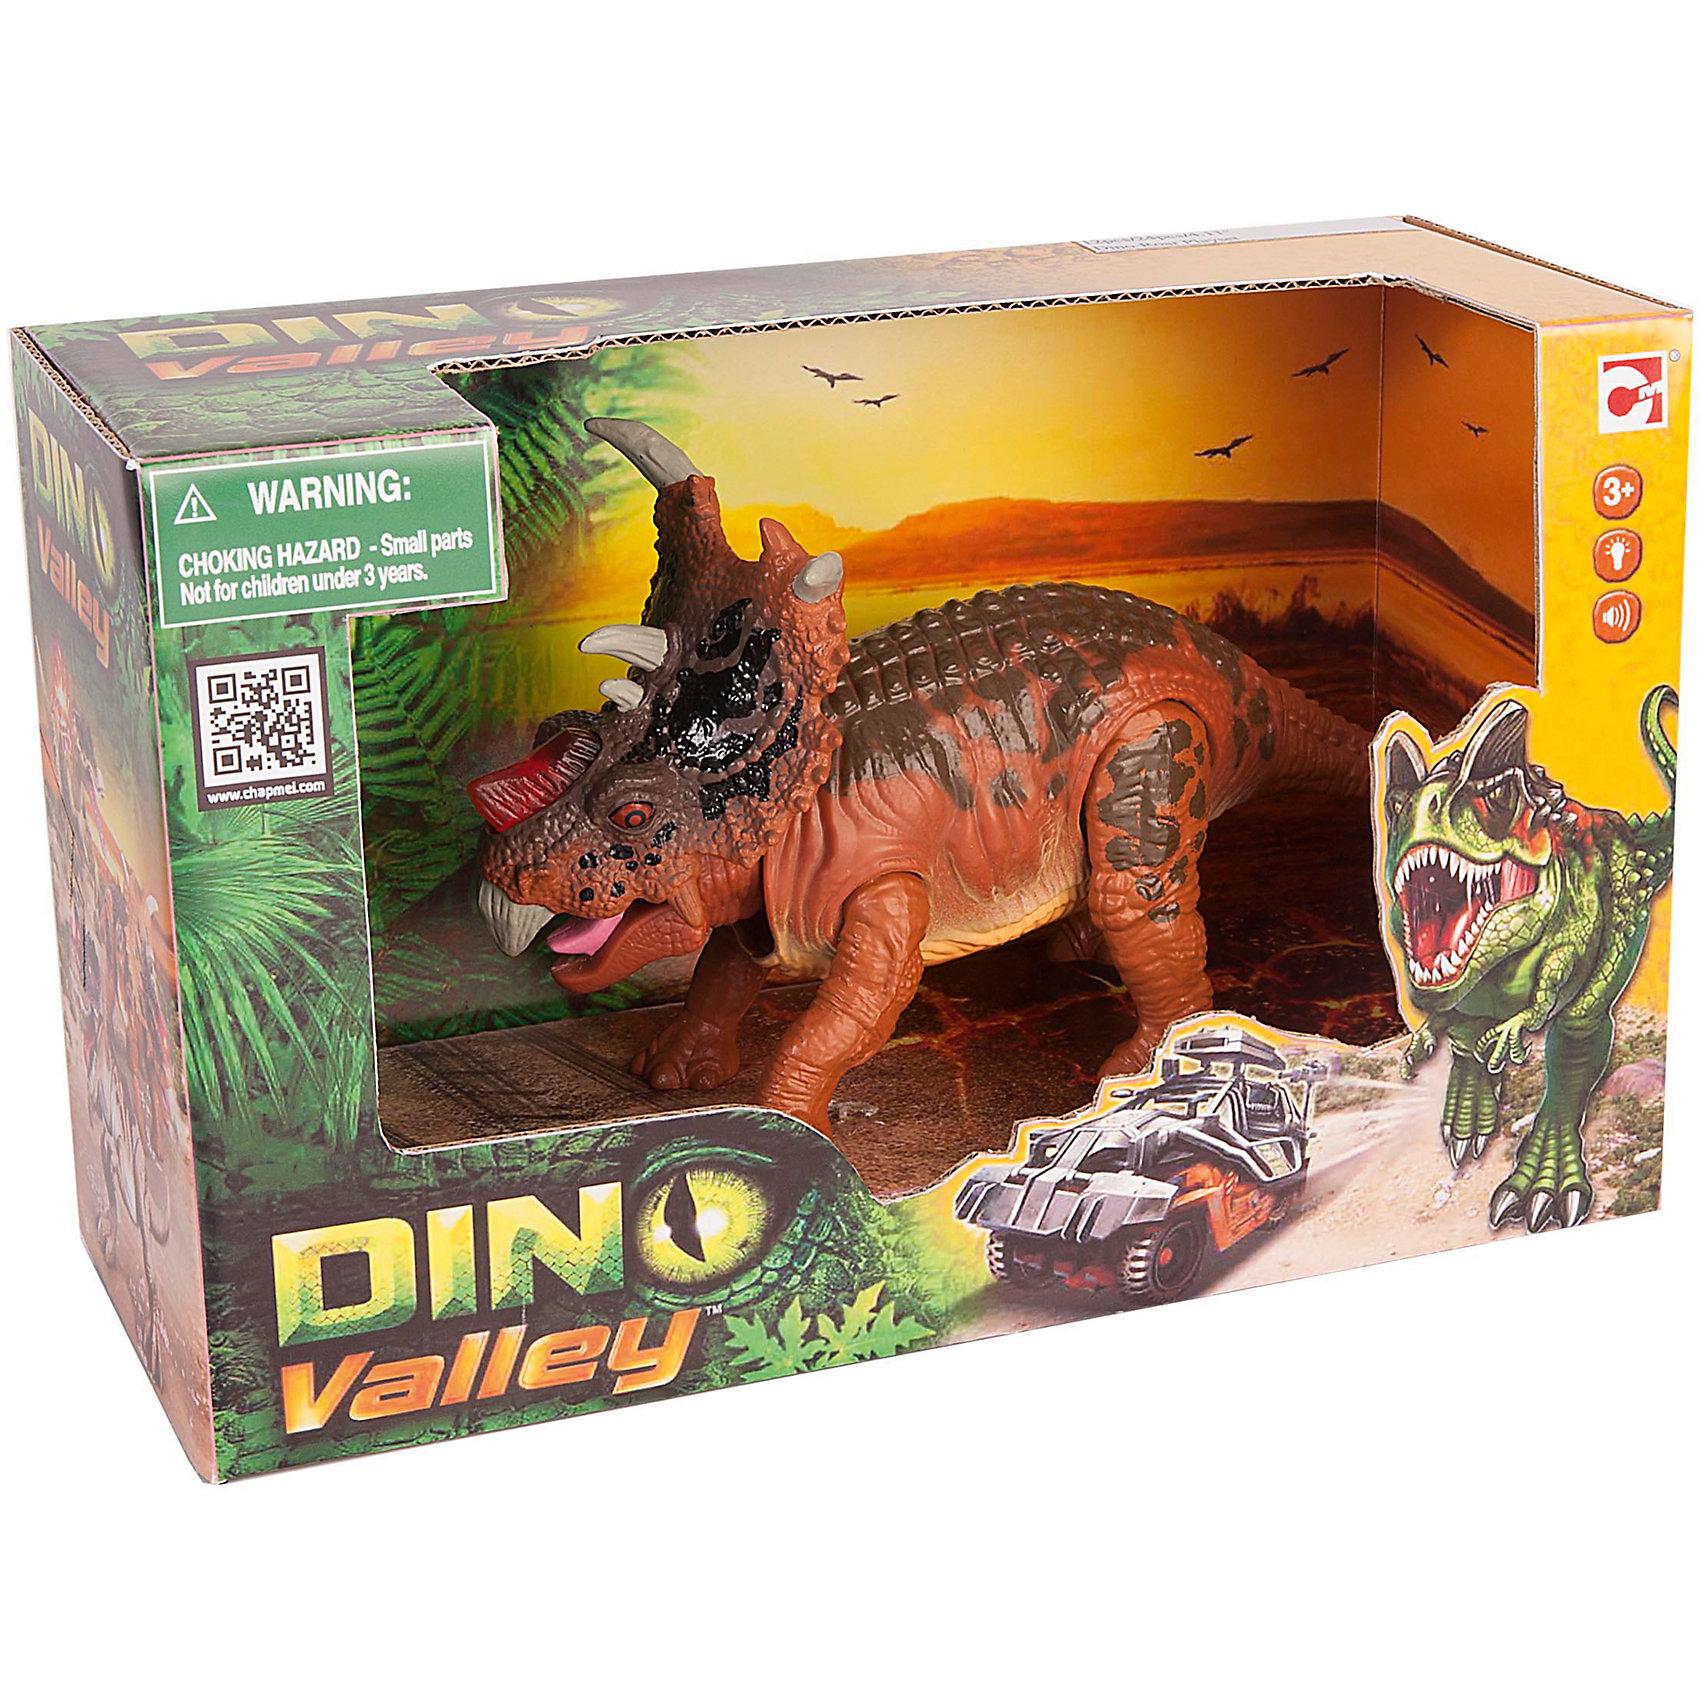 Подвижная фигура Пахиринозавр, Chap MeiДинозавр со звуком (работает на 3х батарейках AG13 функция трай-ми)<br><br>Ширина мм: 254<br>Глубина мм: 95<br>Высота мм: 159<br>Вес г: 606<br>Возраст от месяцев: 36<br>Возраст до месяцев: 2147483647<br>Пол: Унисекс<br>Возраст: Детский<br>SKU: 5503286